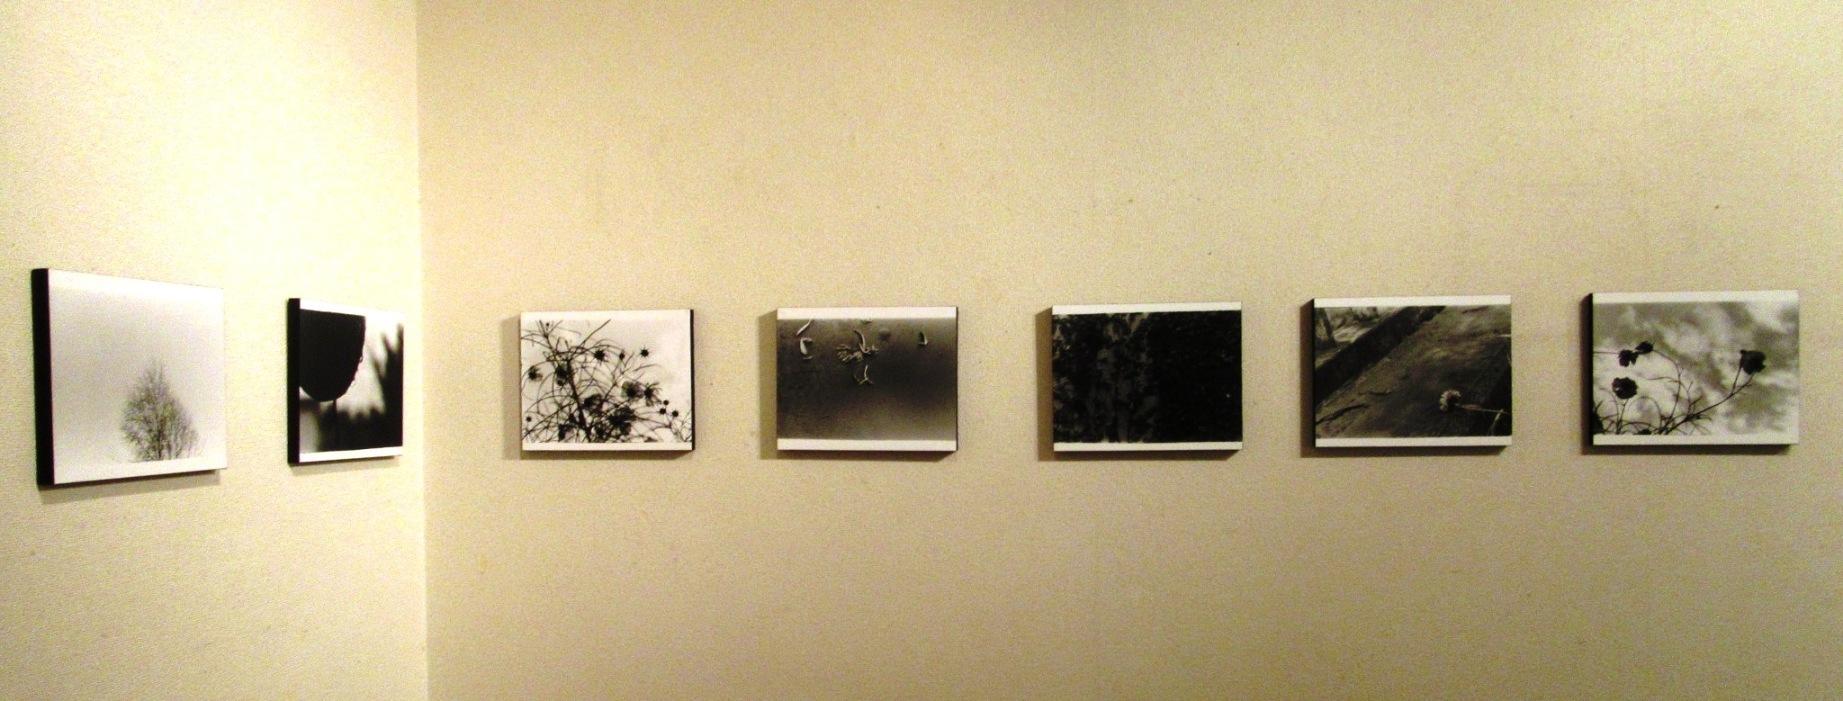 2569)②「『moment』 篠原 奈那子(藤女子大学4年)写真展」 アートスペース201 8月3日(木)~8月7日(火)_f0126829_11073525.jpg